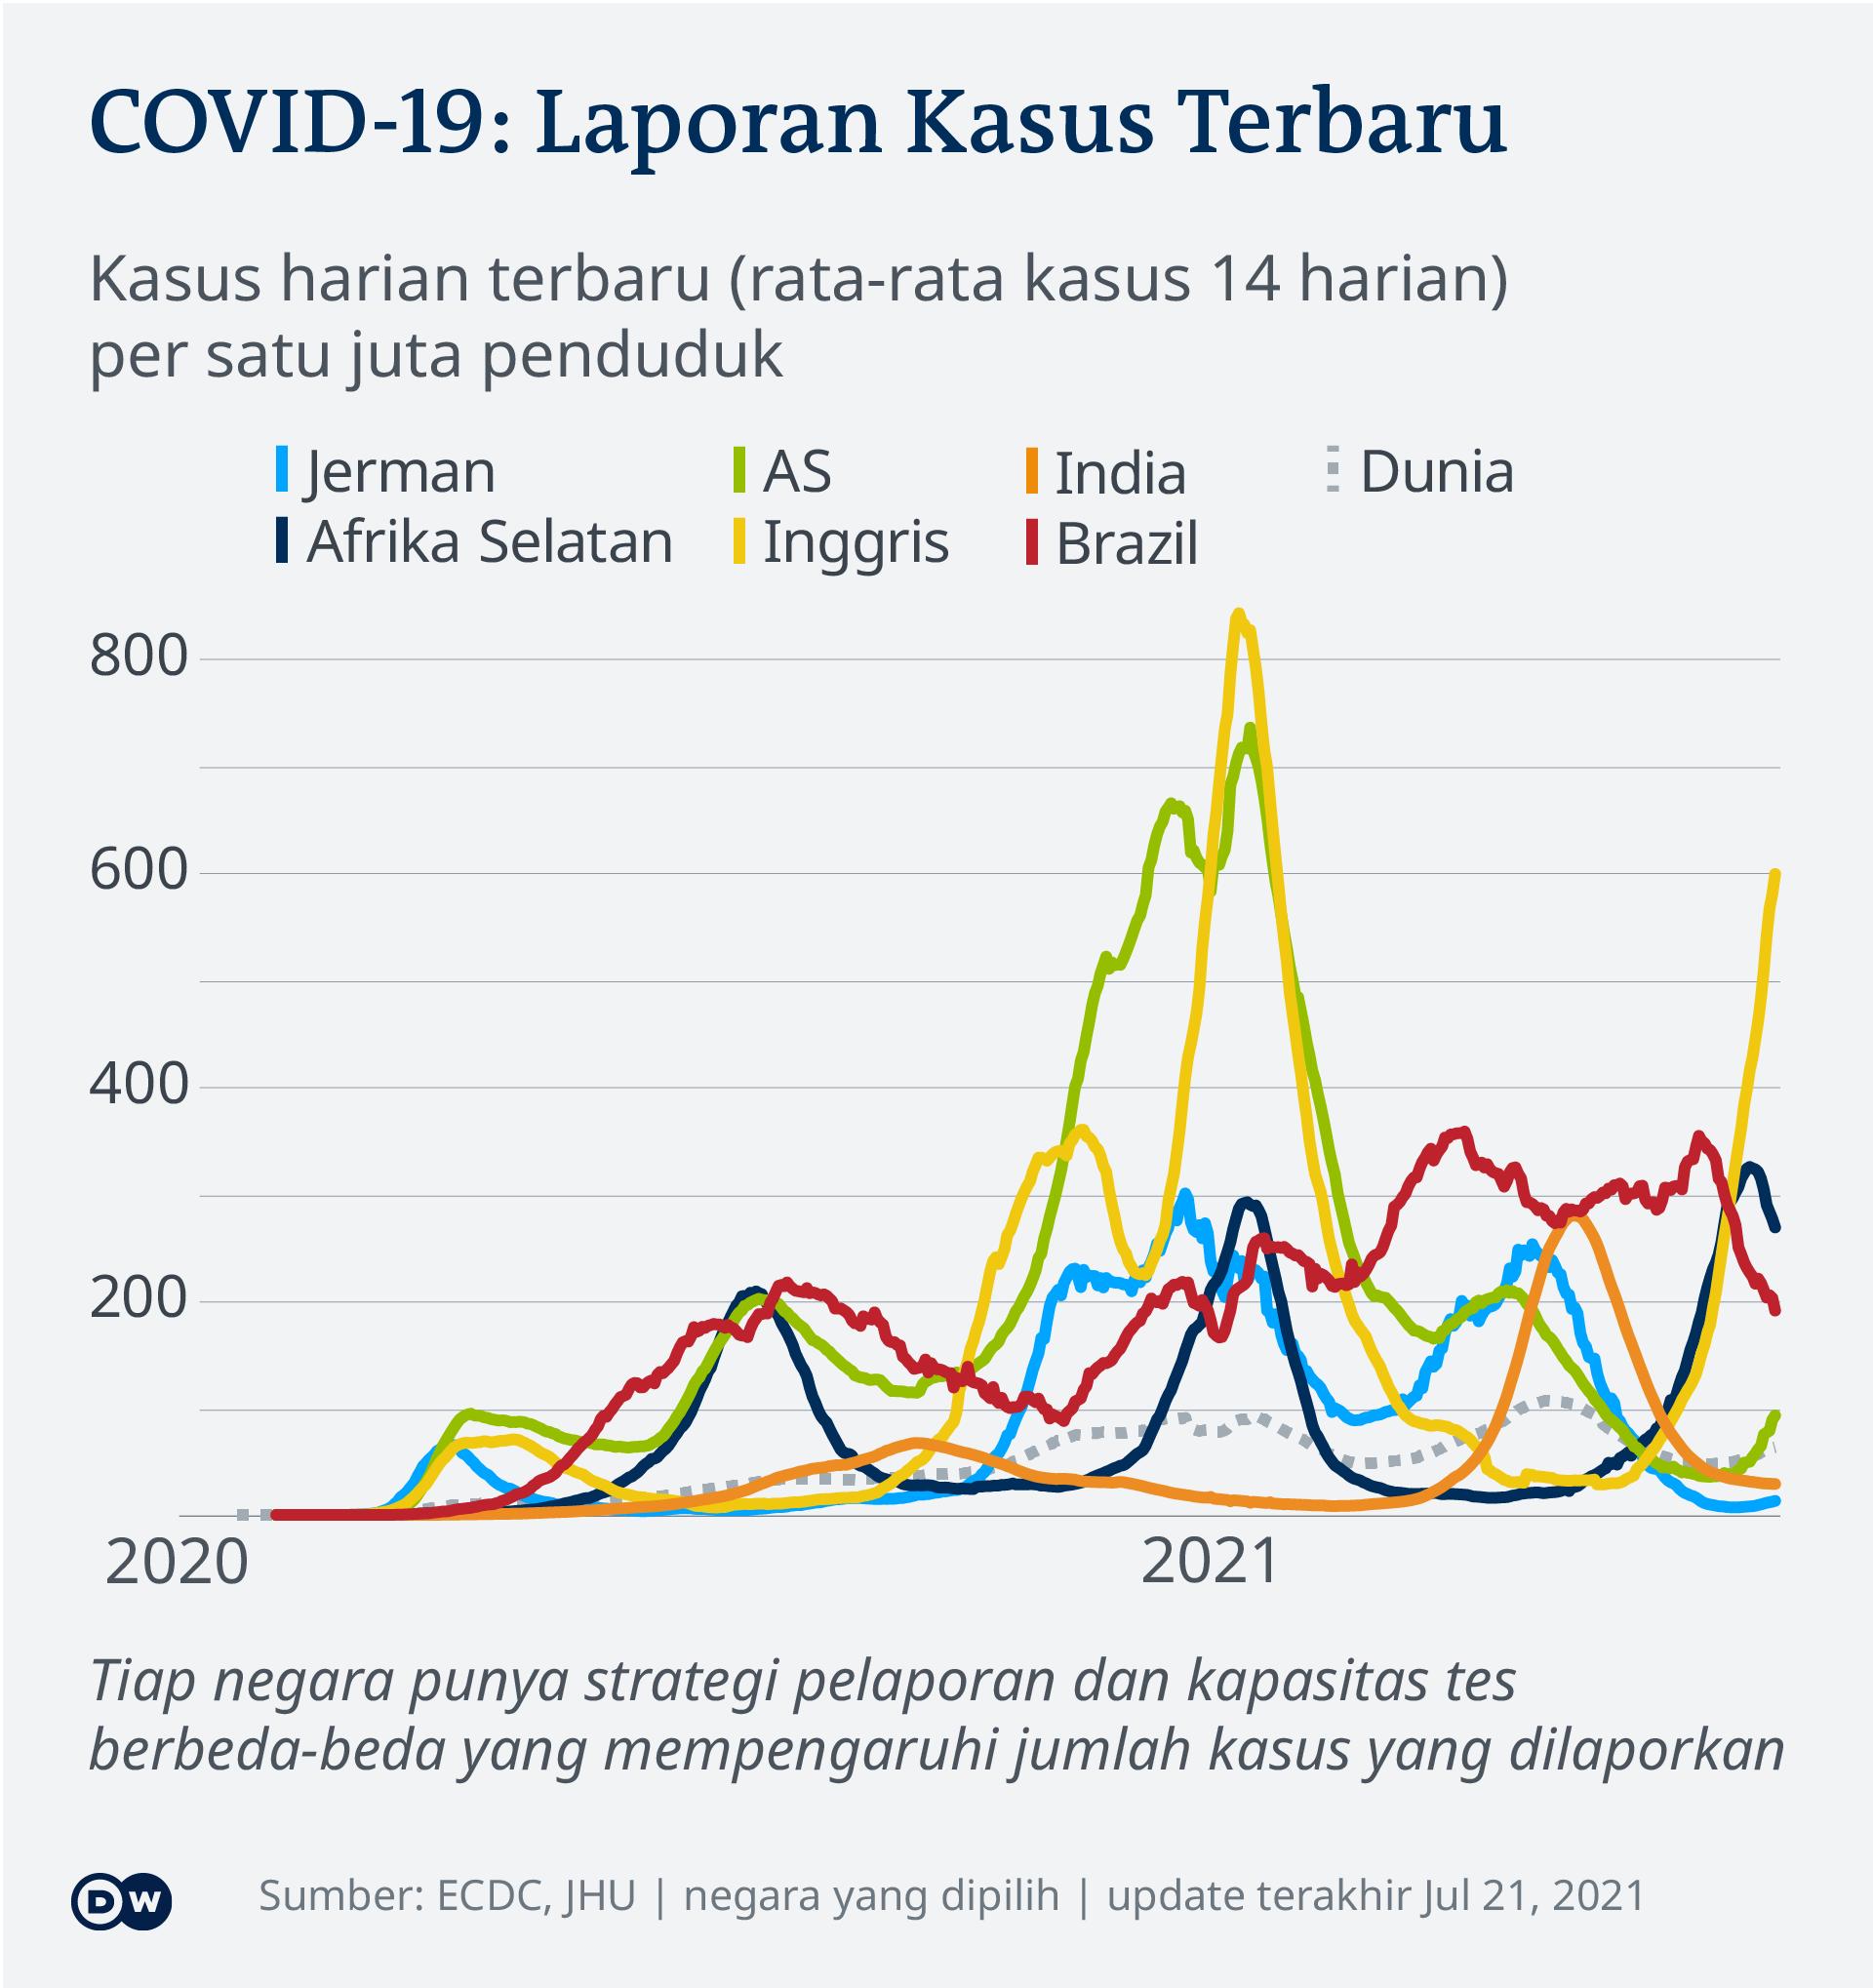 Data kasus harian terbaru COVID-19 di beberapa negara tiap satu juta penduduk.